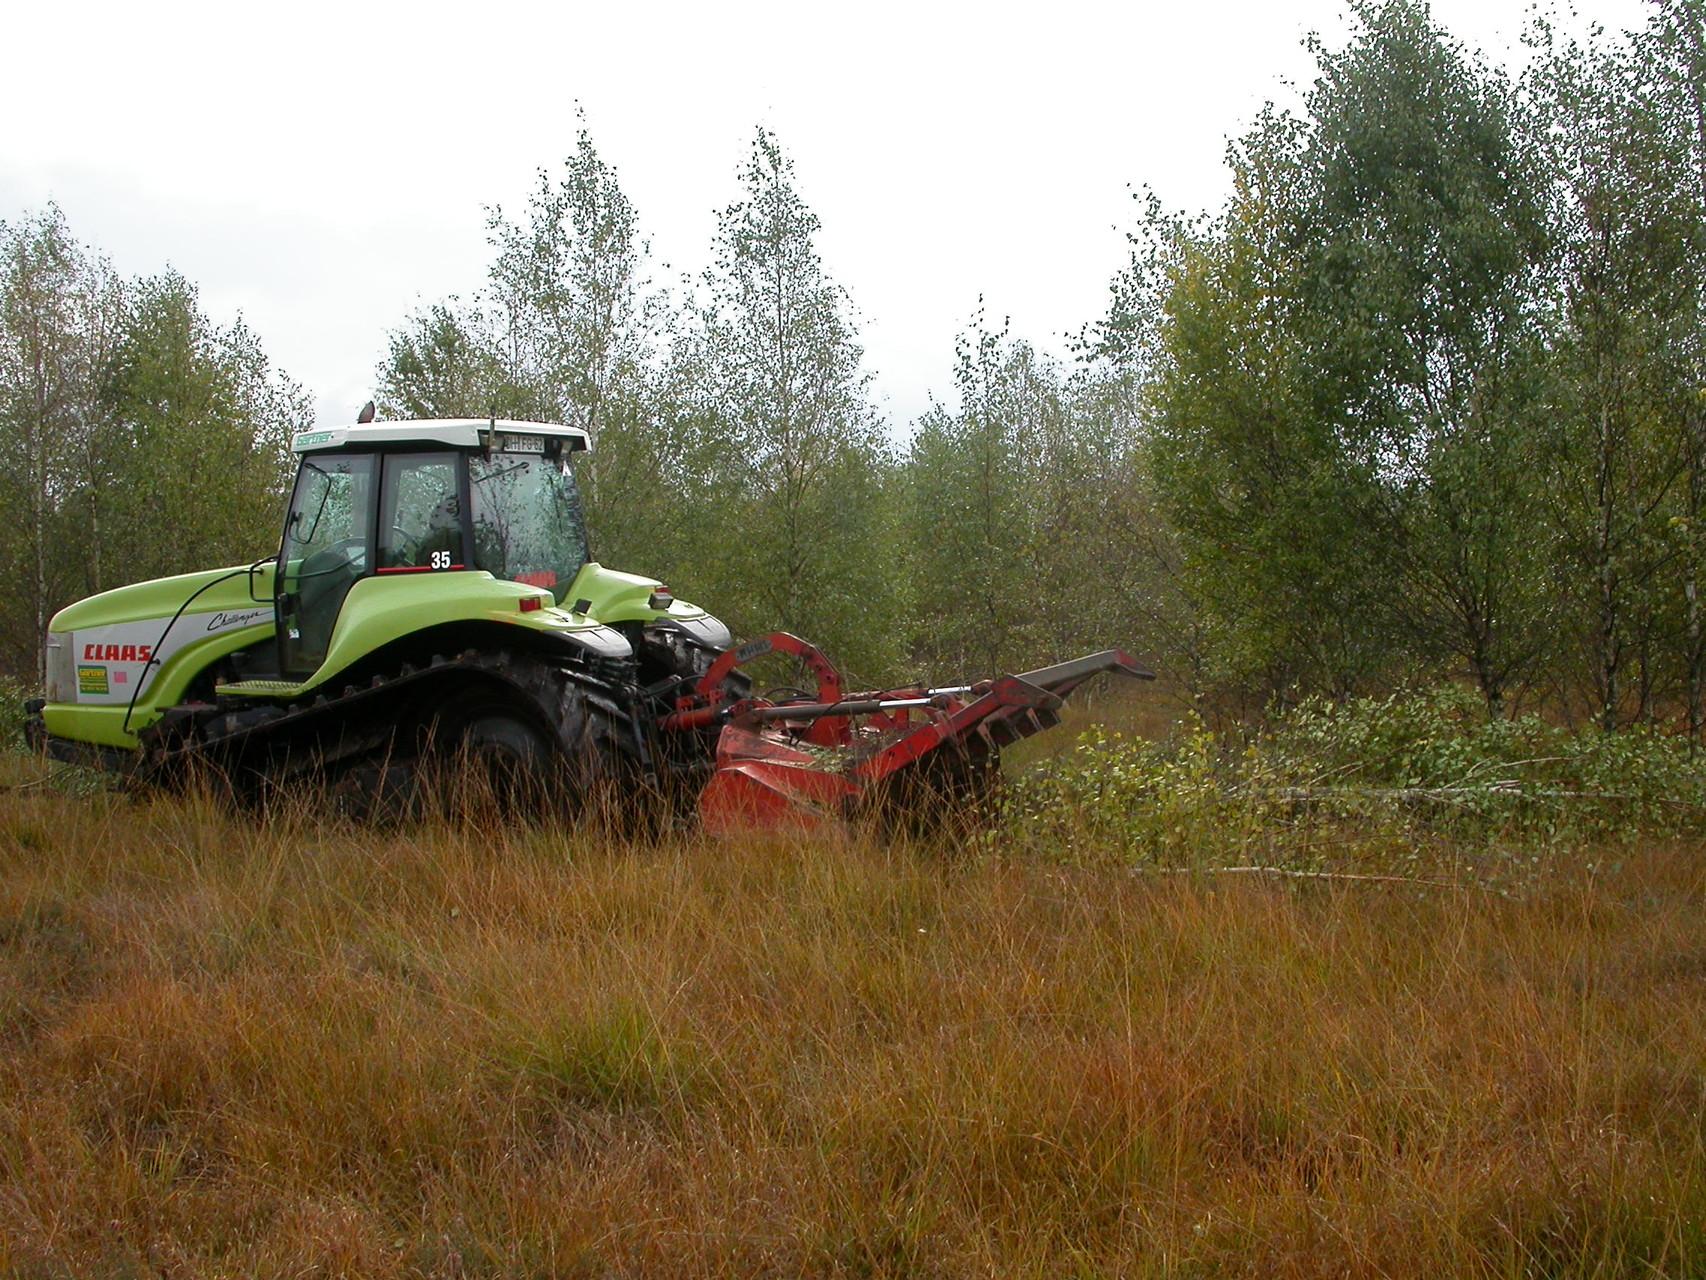 3. Forstfräse im Oktober 2004